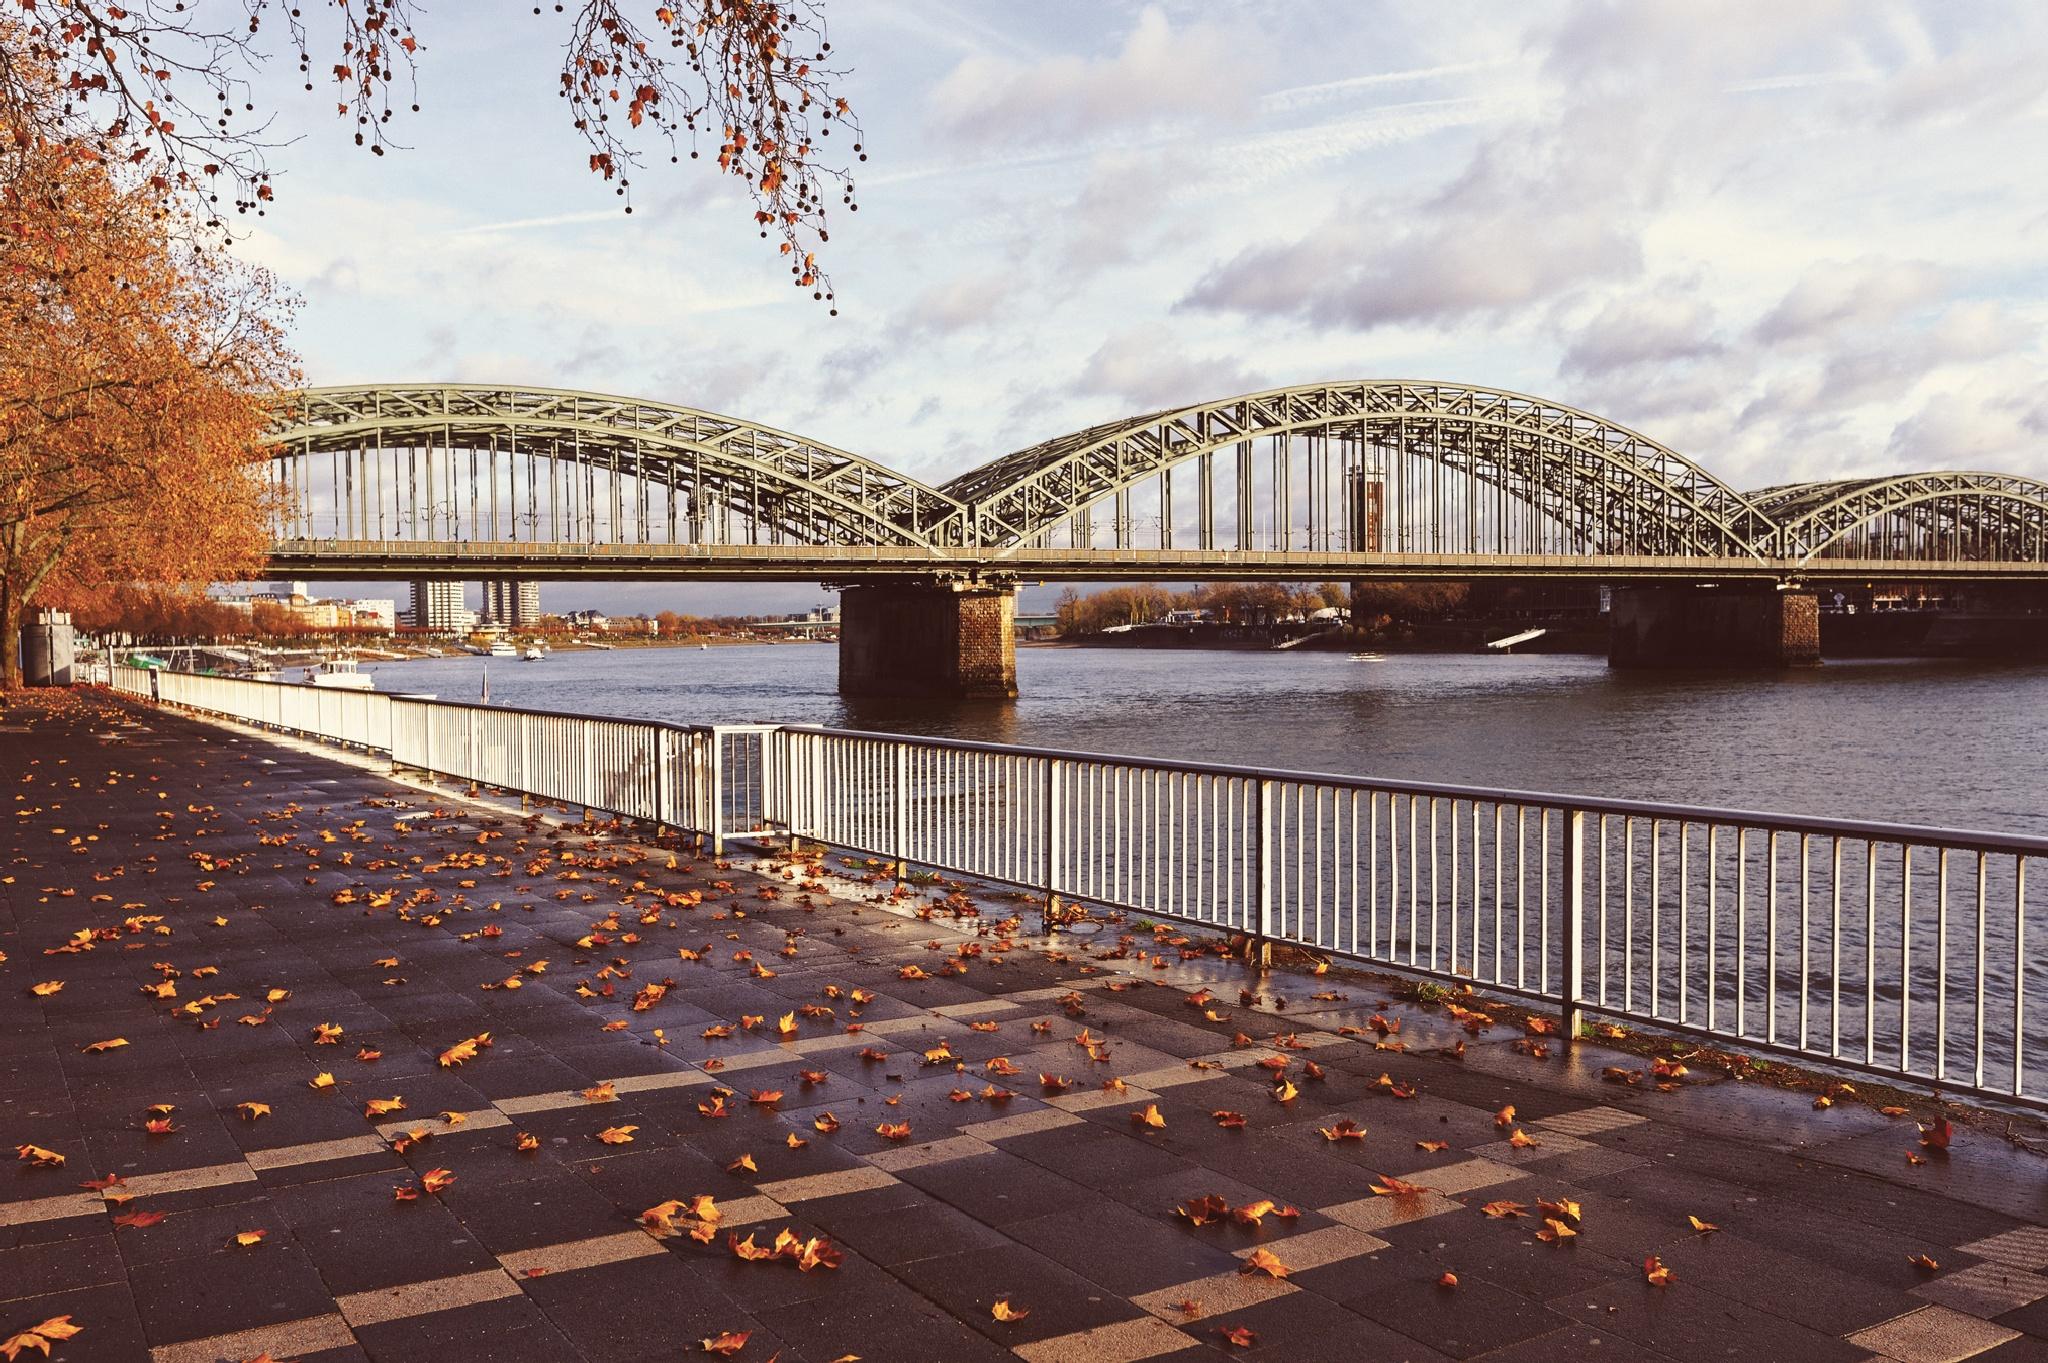 The Hohenzollern bridge. by mihaipiscureanu